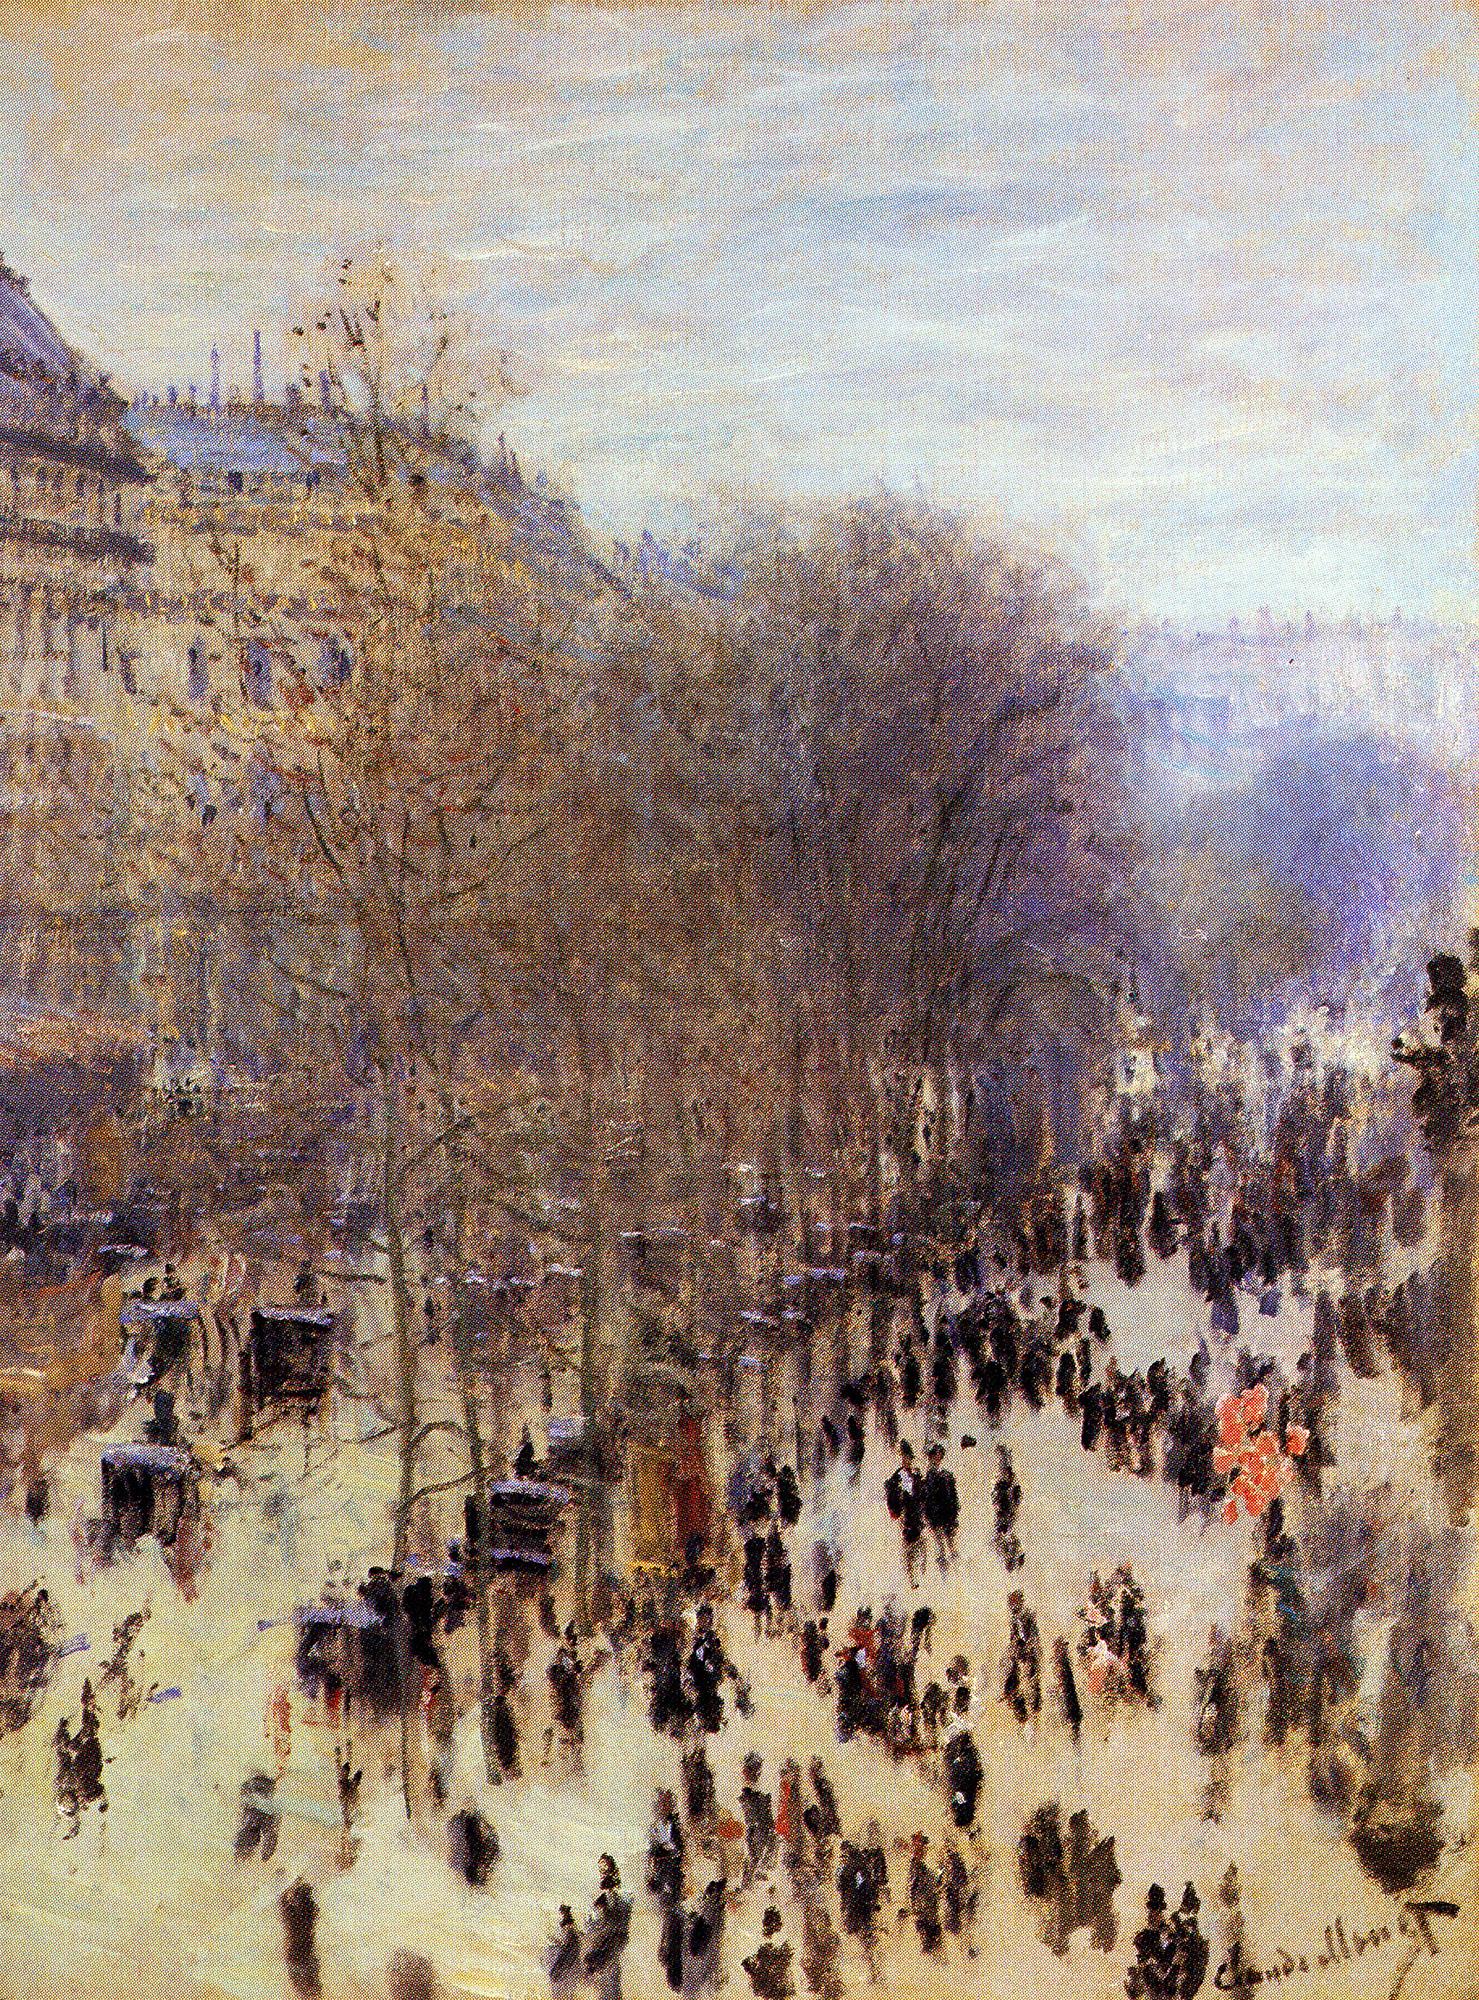 Claude Monet, Boulevard des Capucines, 1873-4